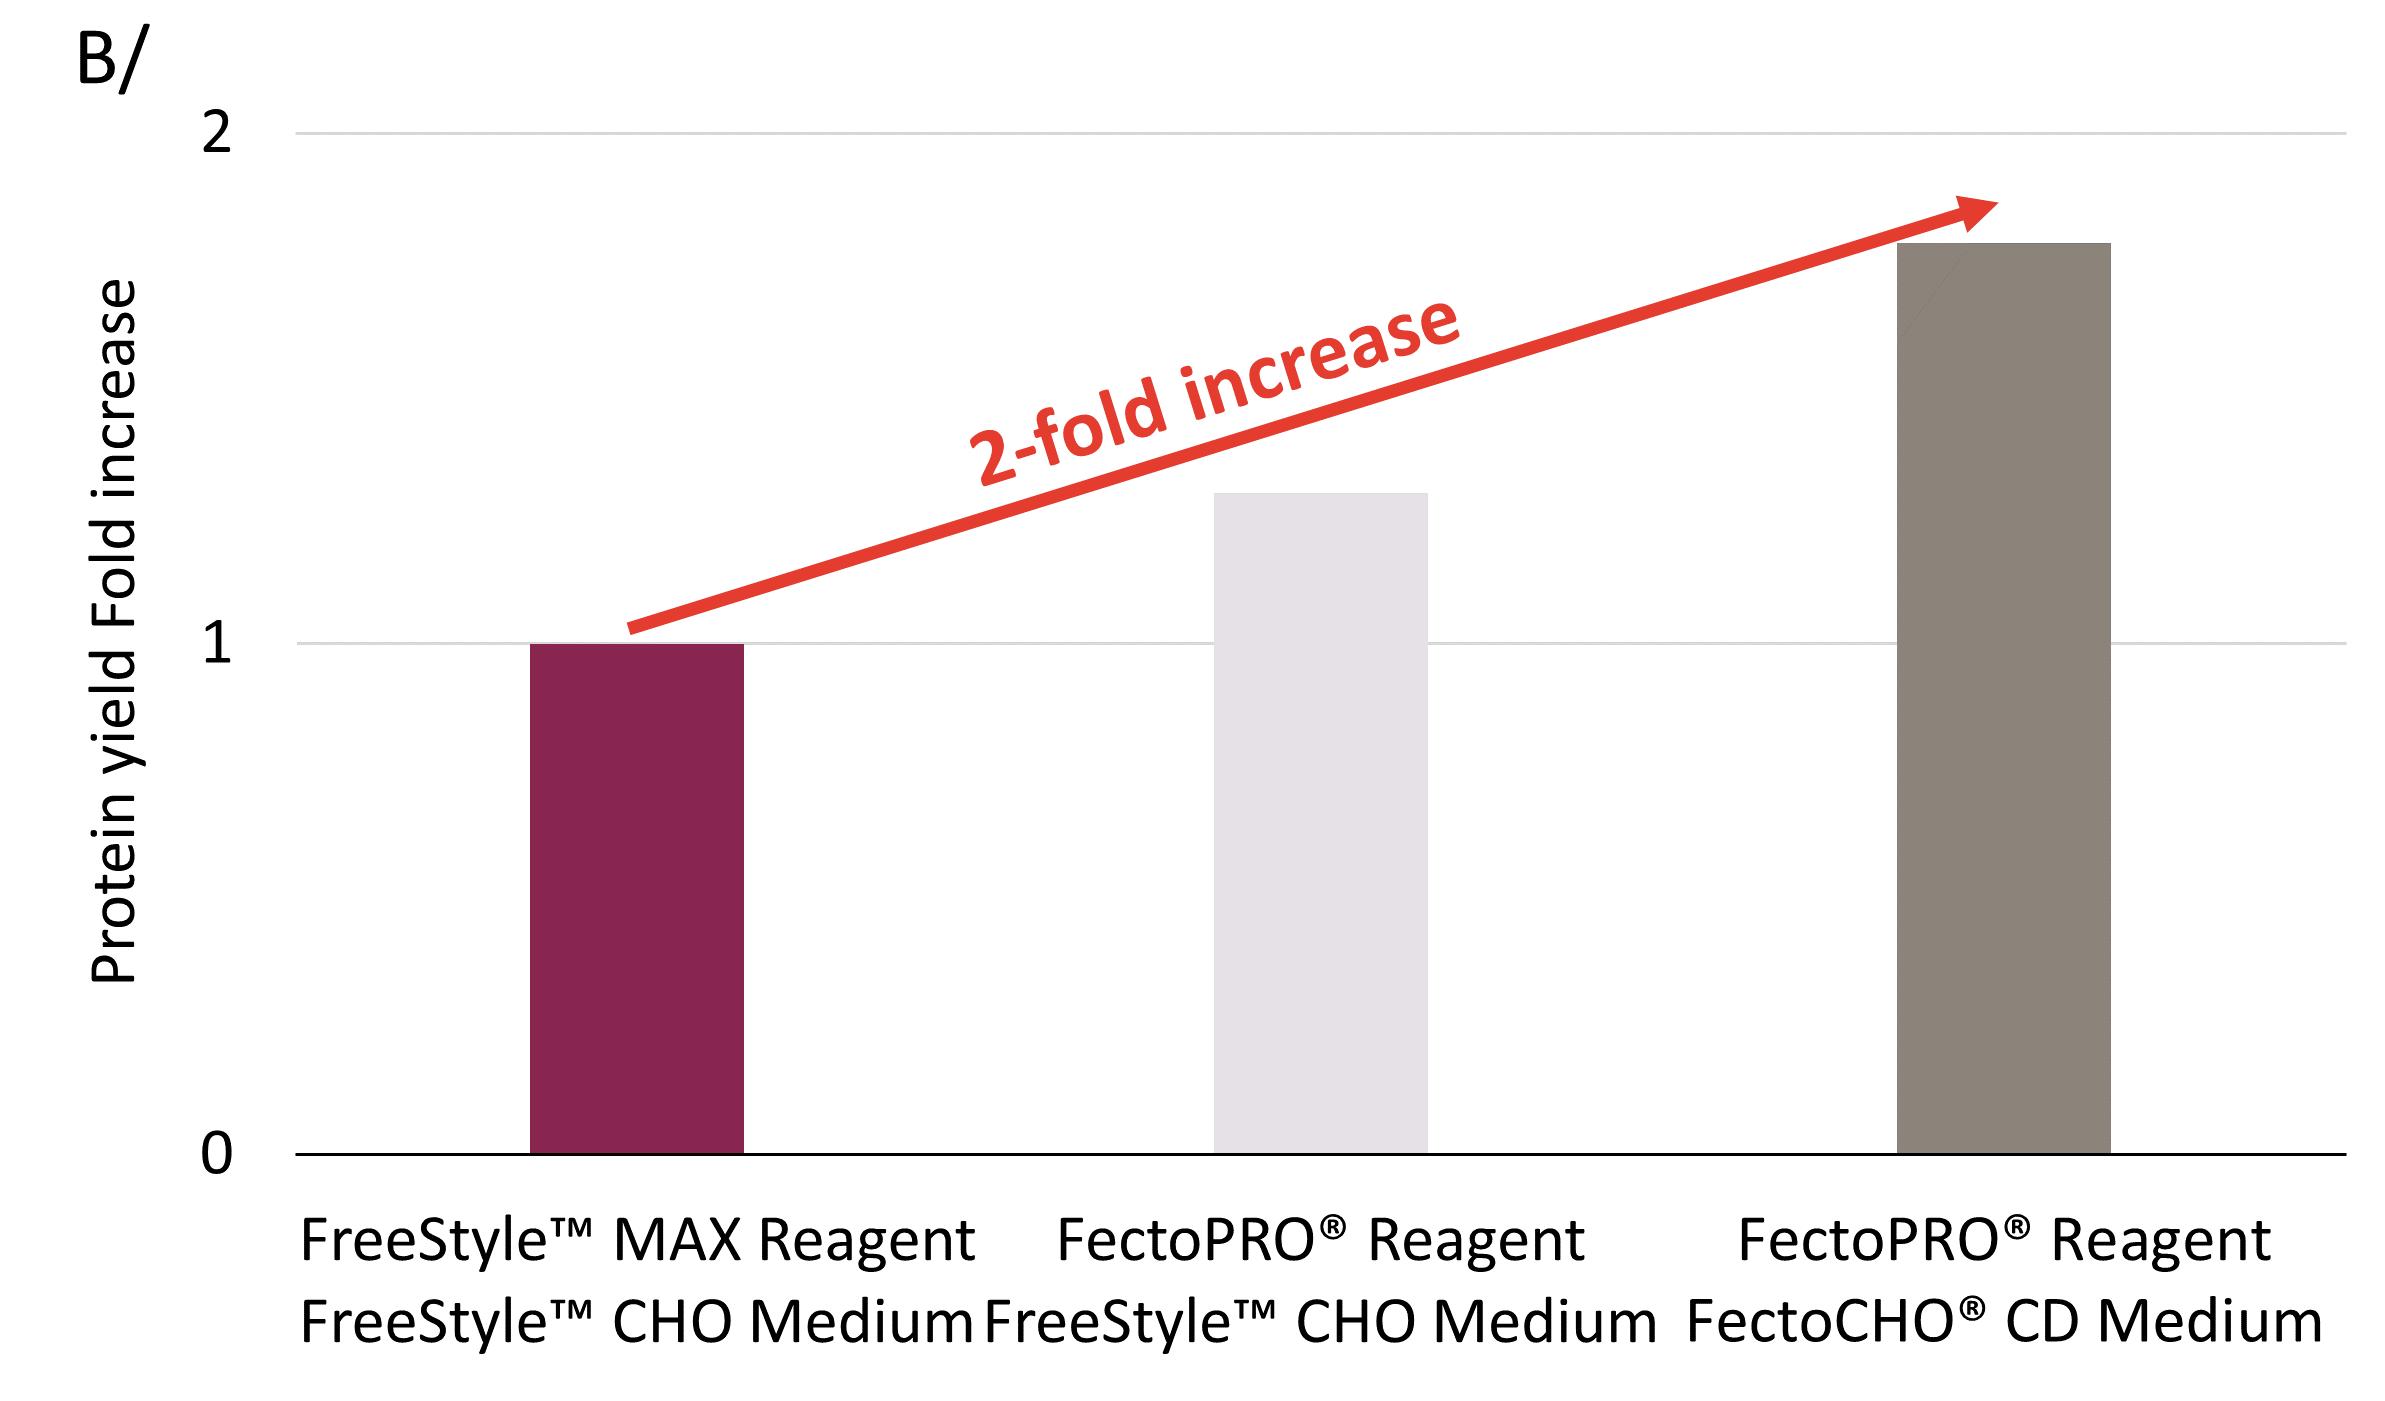 FectoCHO - Fold increase CHO-S 2020